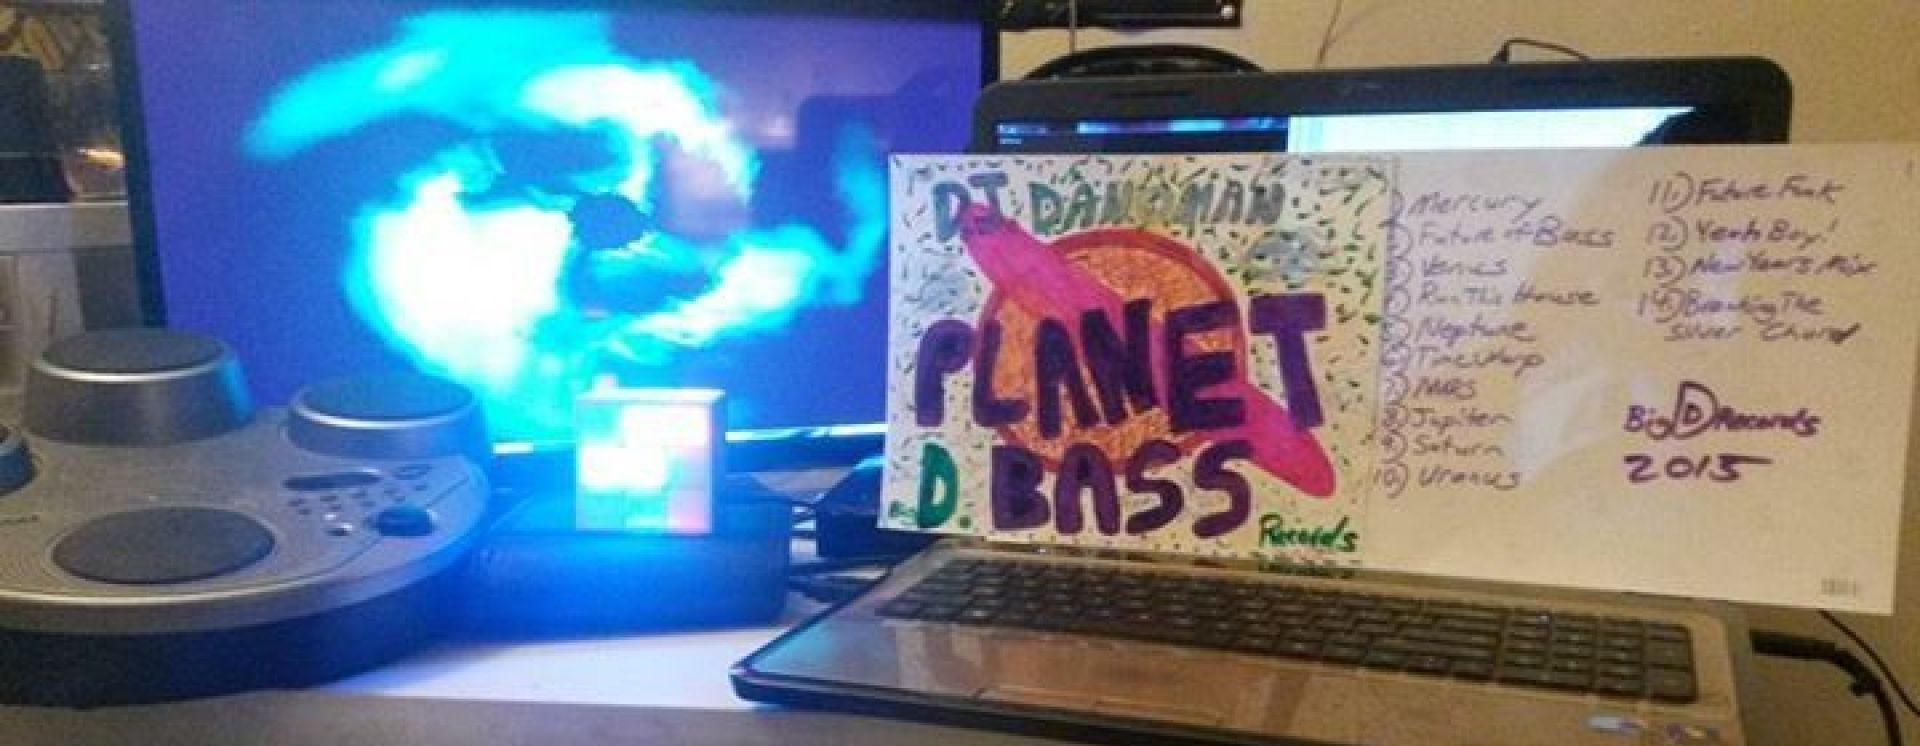 1434348490 dj danoplanets copy